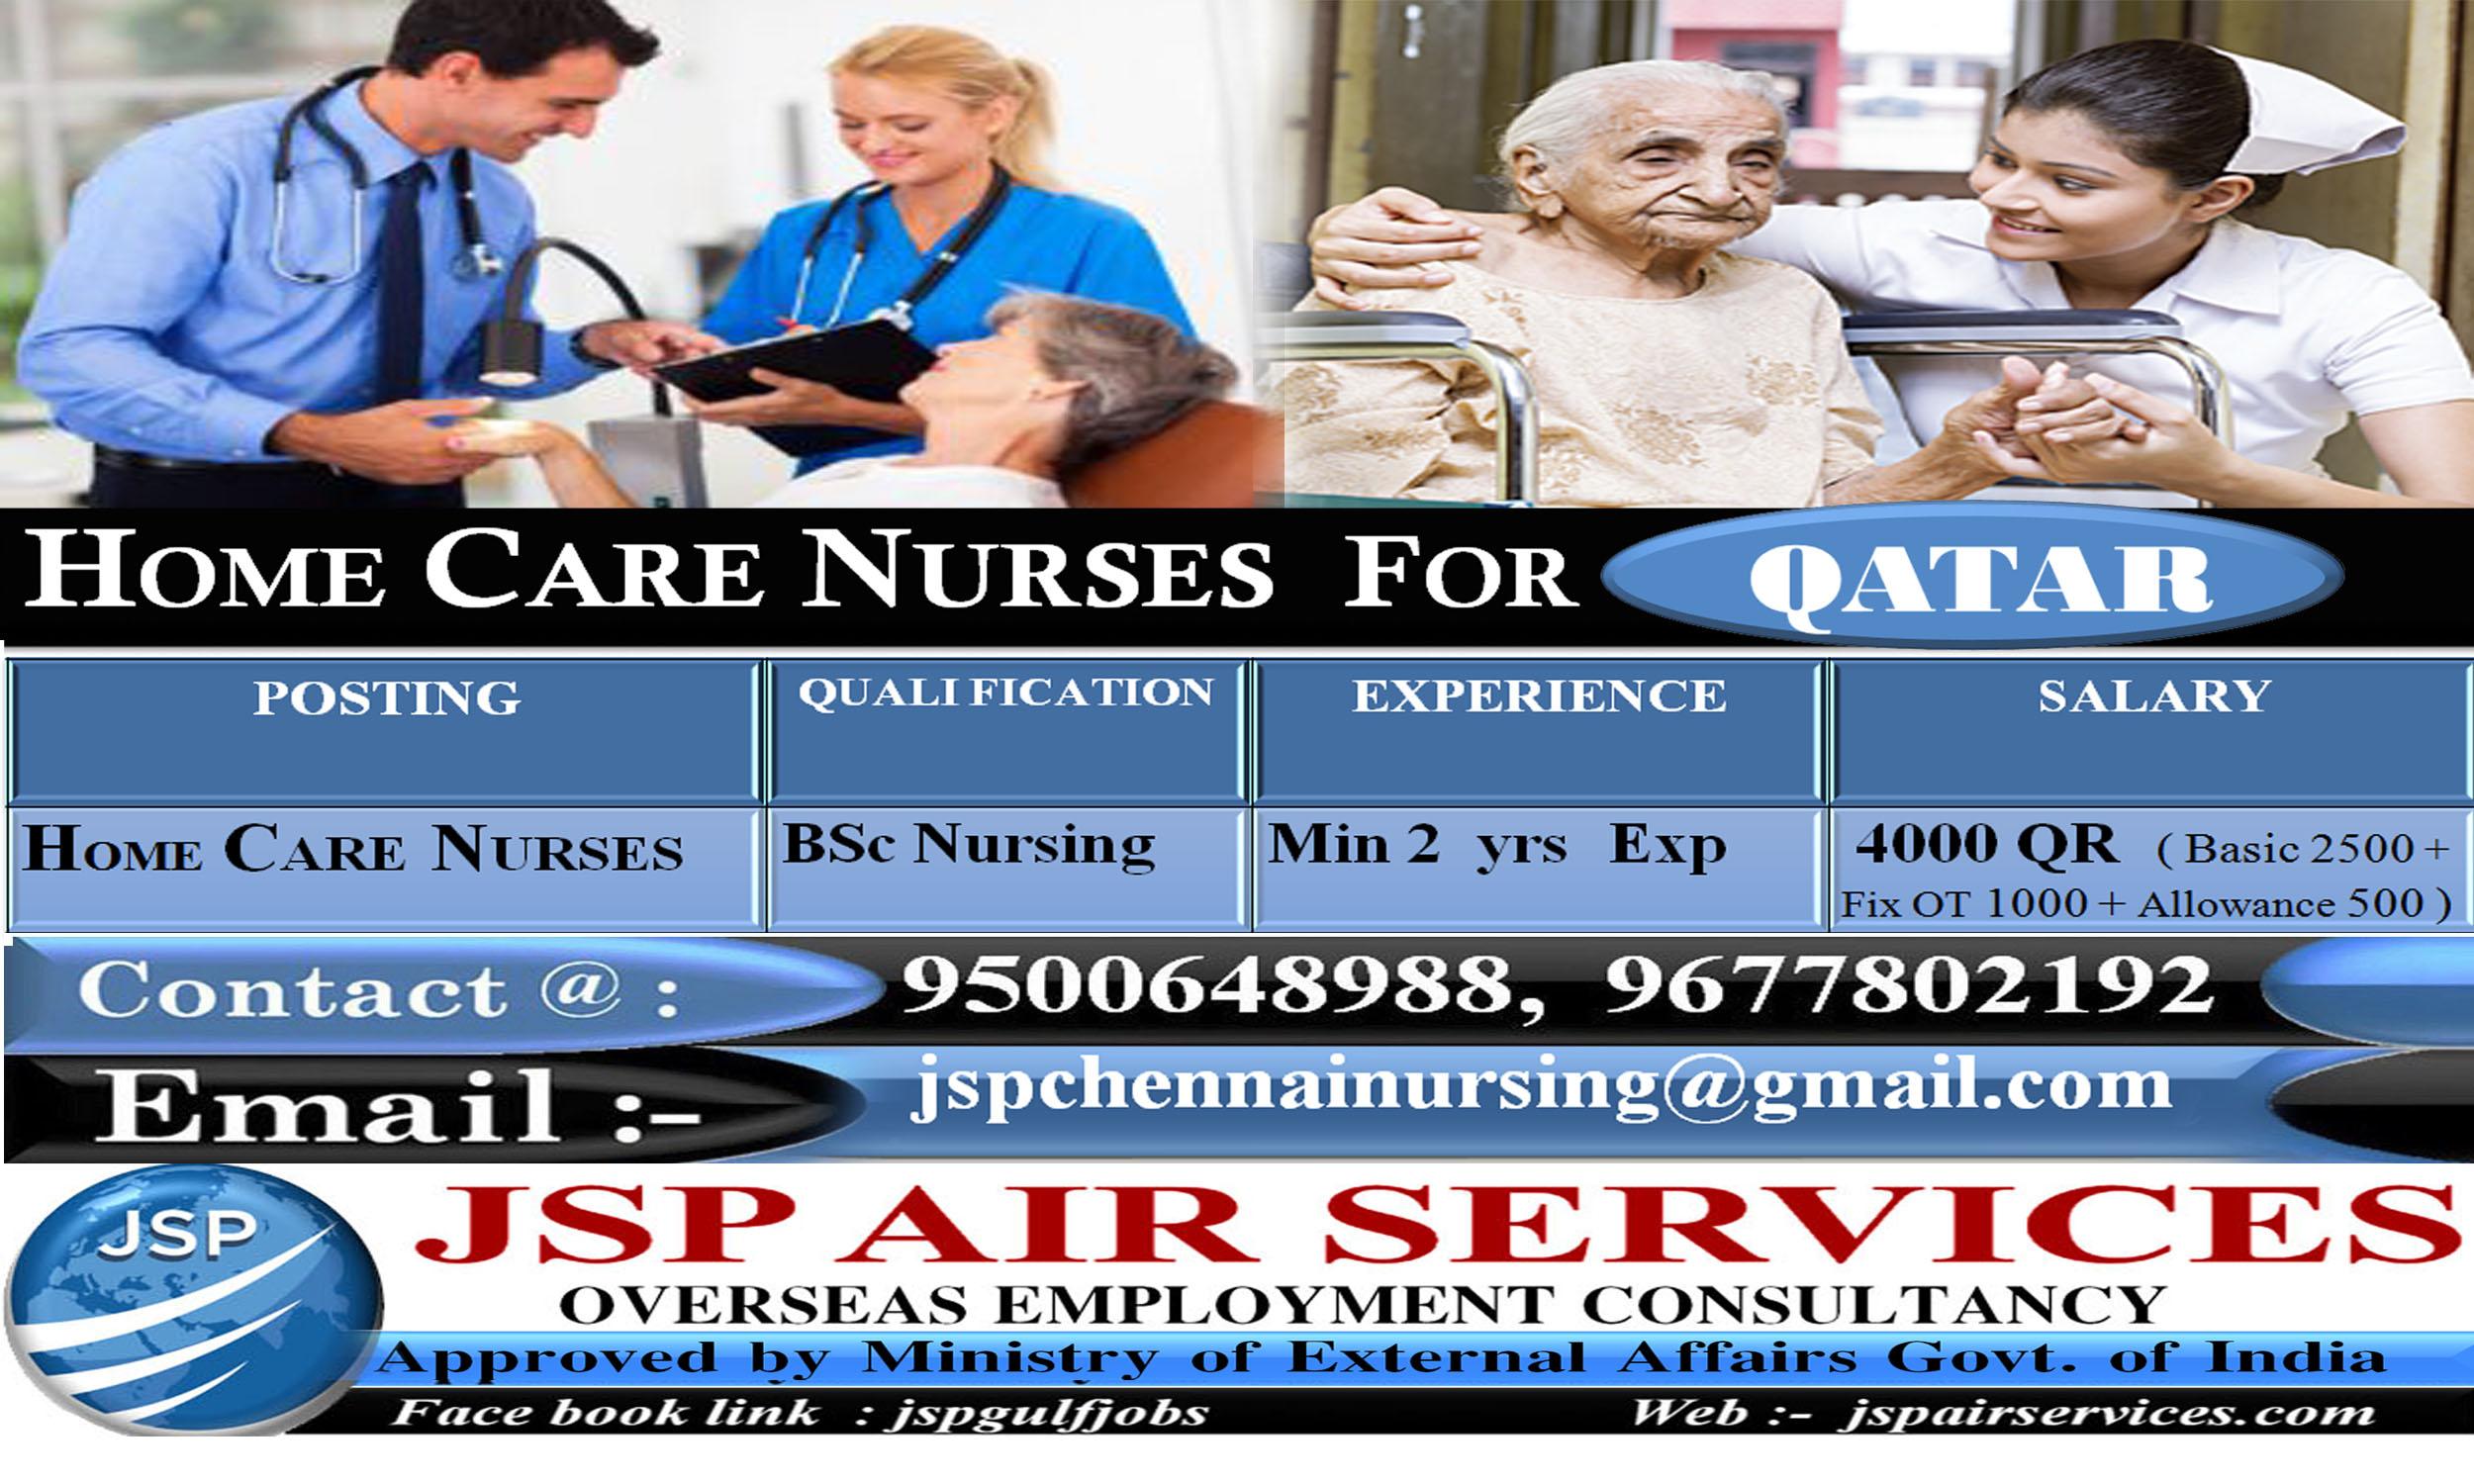 URGENT REQUIREMENT NURSES FOR QATAR - HOME CARE NURSES